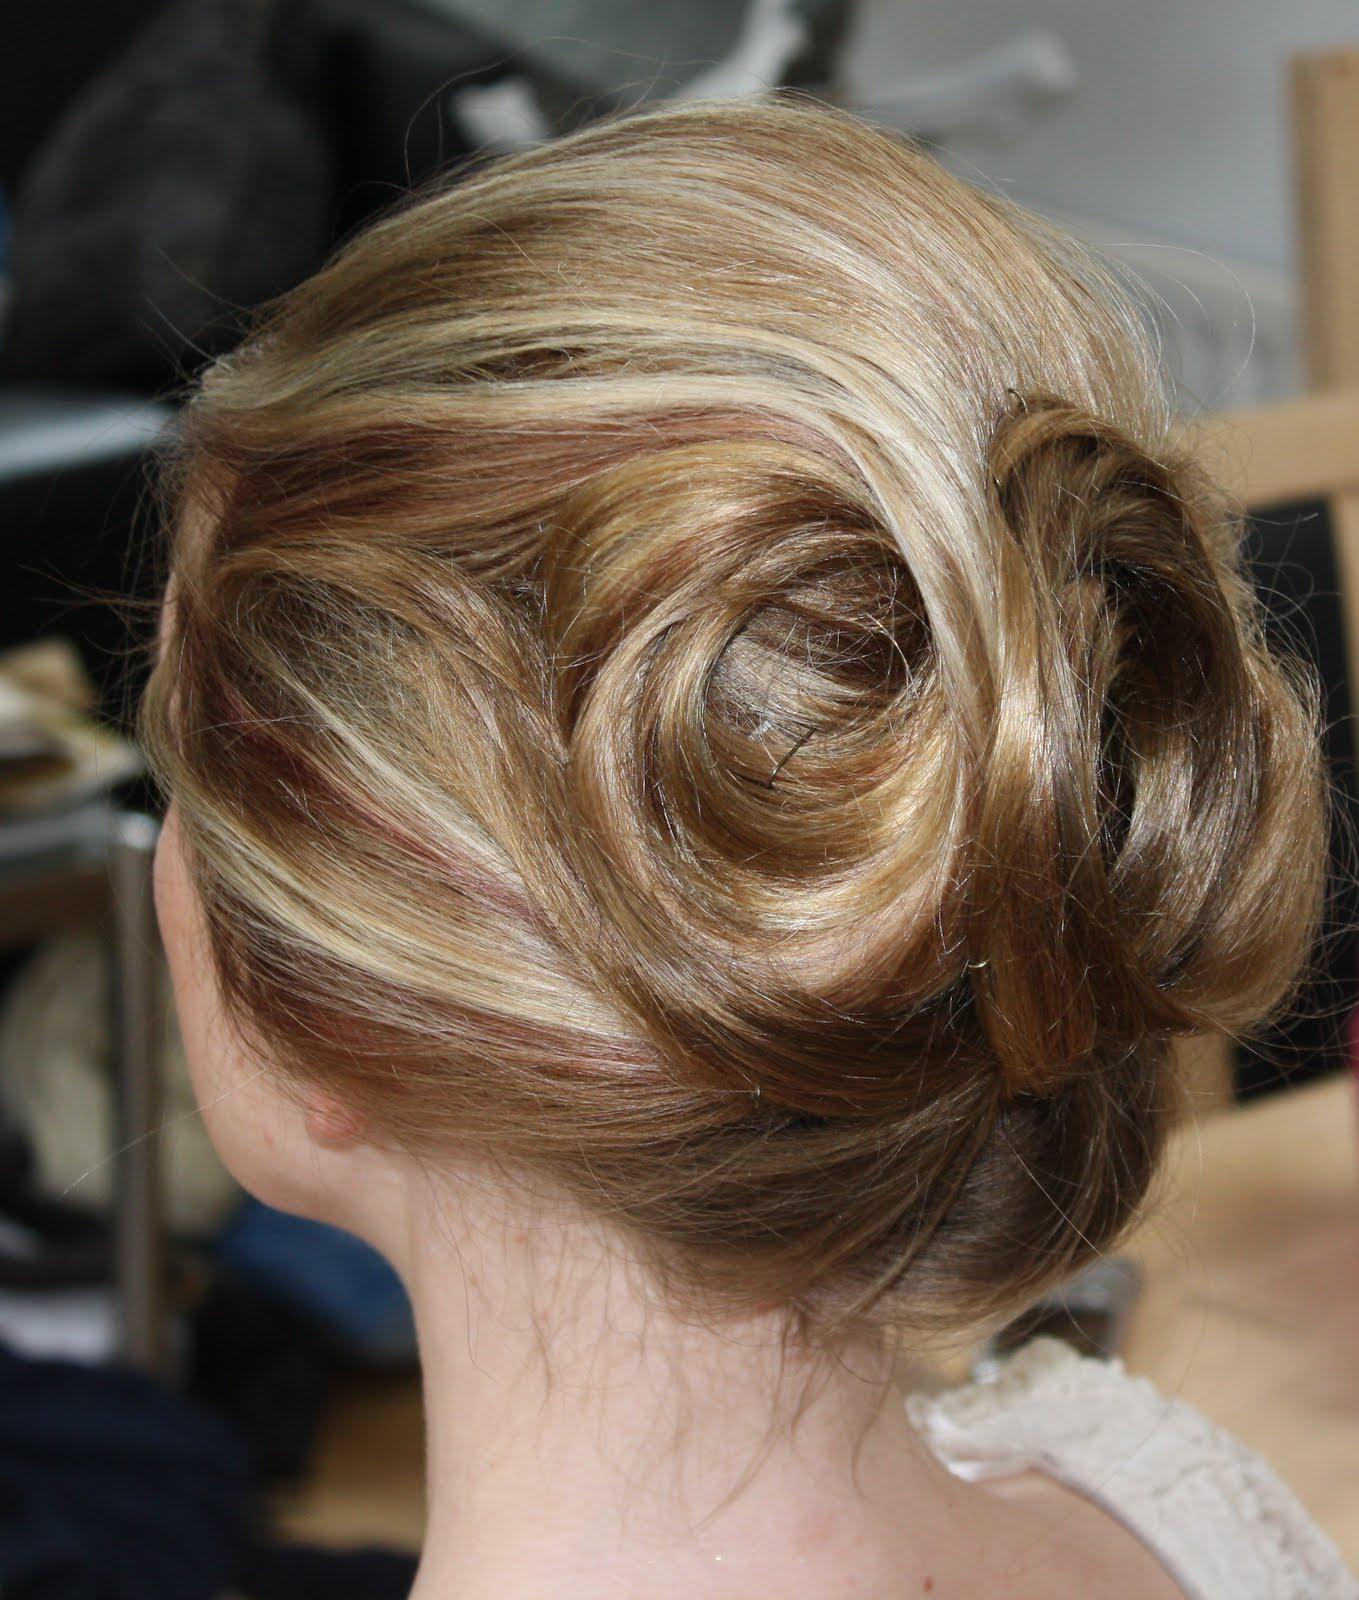 Hair Up Doassic Looks Hair Trends Hair Up Do Style Hairdressing